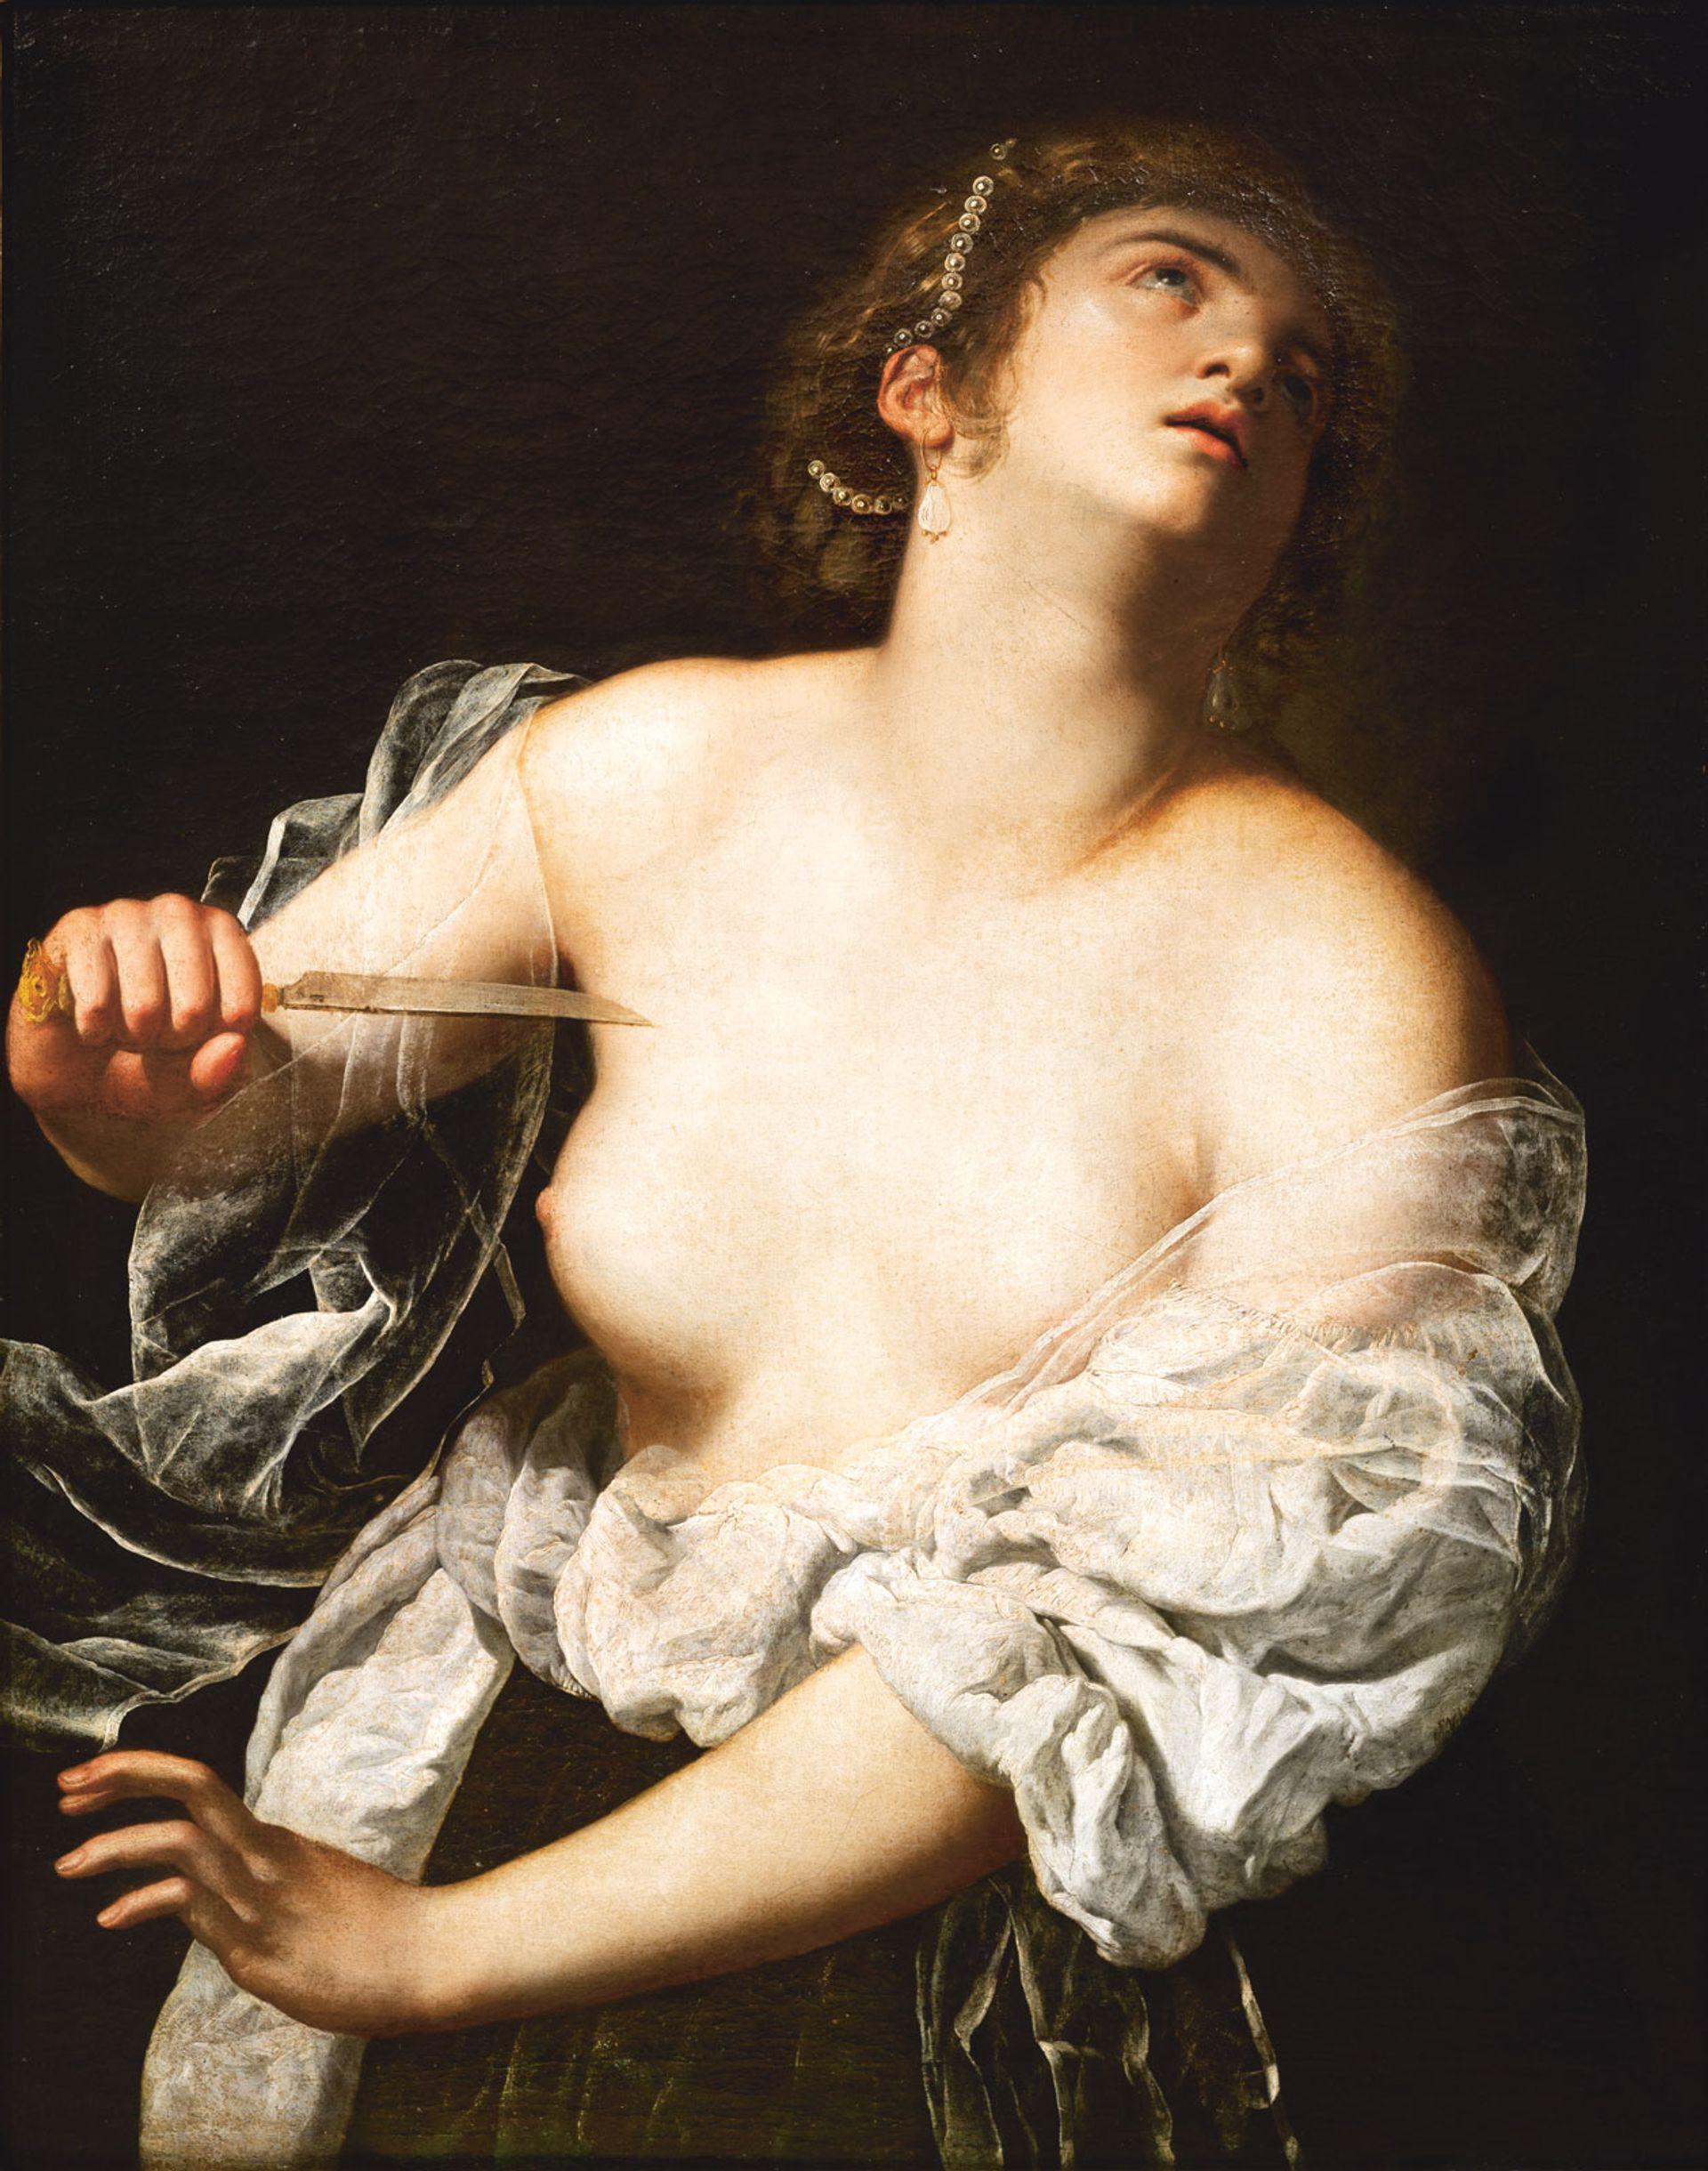 Artemisia Gentileschi's depiction of Lucretia sold for €4.8m at Artcurial © Artcurial